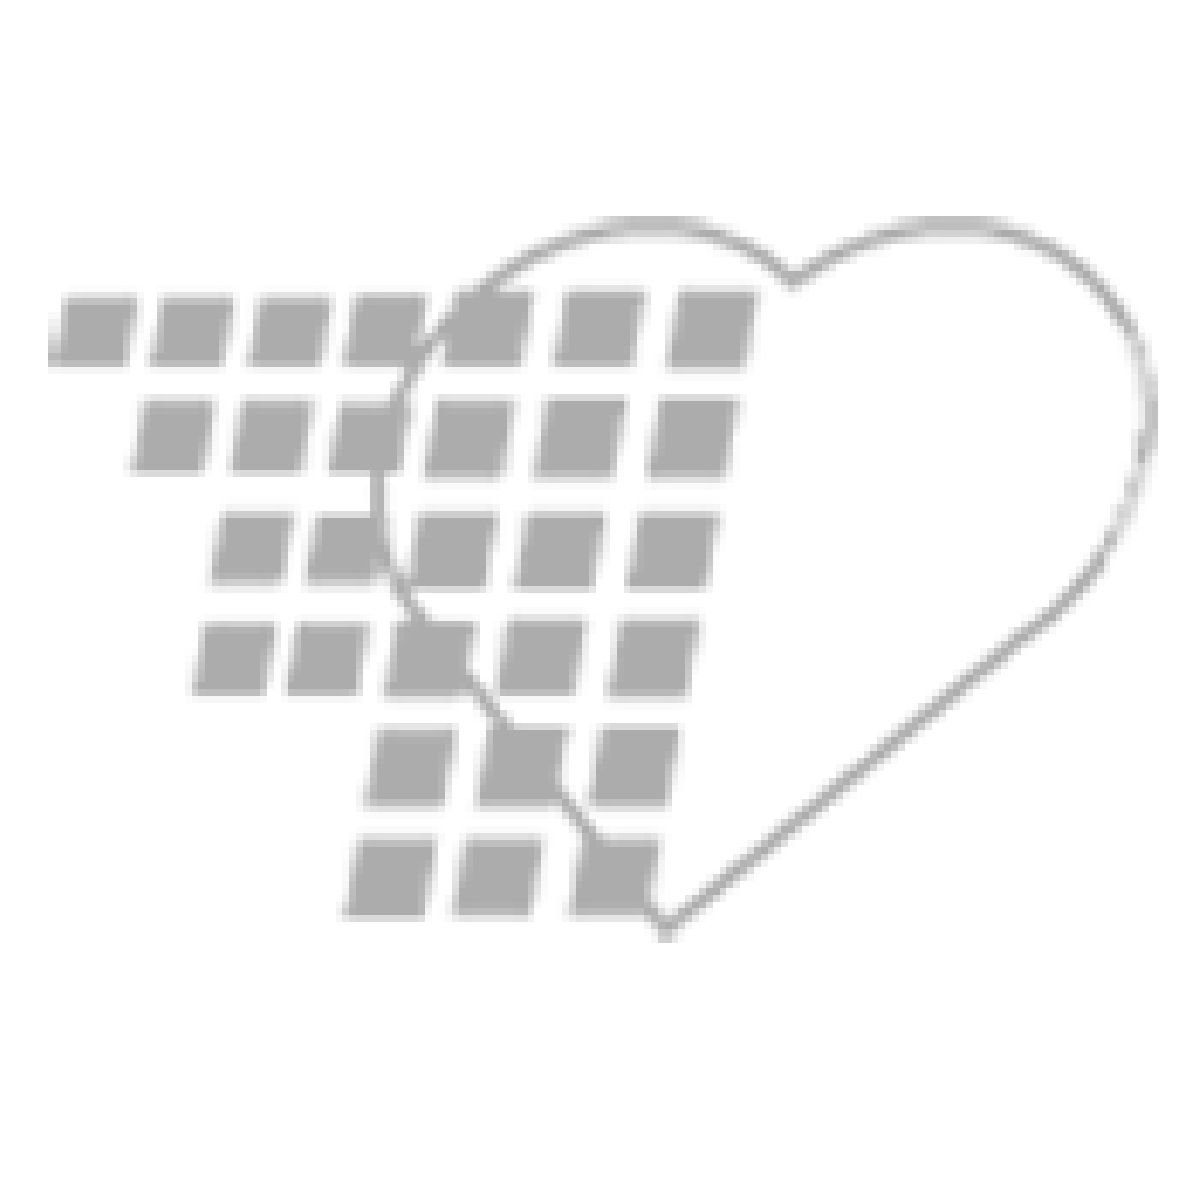 06-93-0411 Demo Dose® Calcim Gluconat 100mg/mL 100 mL